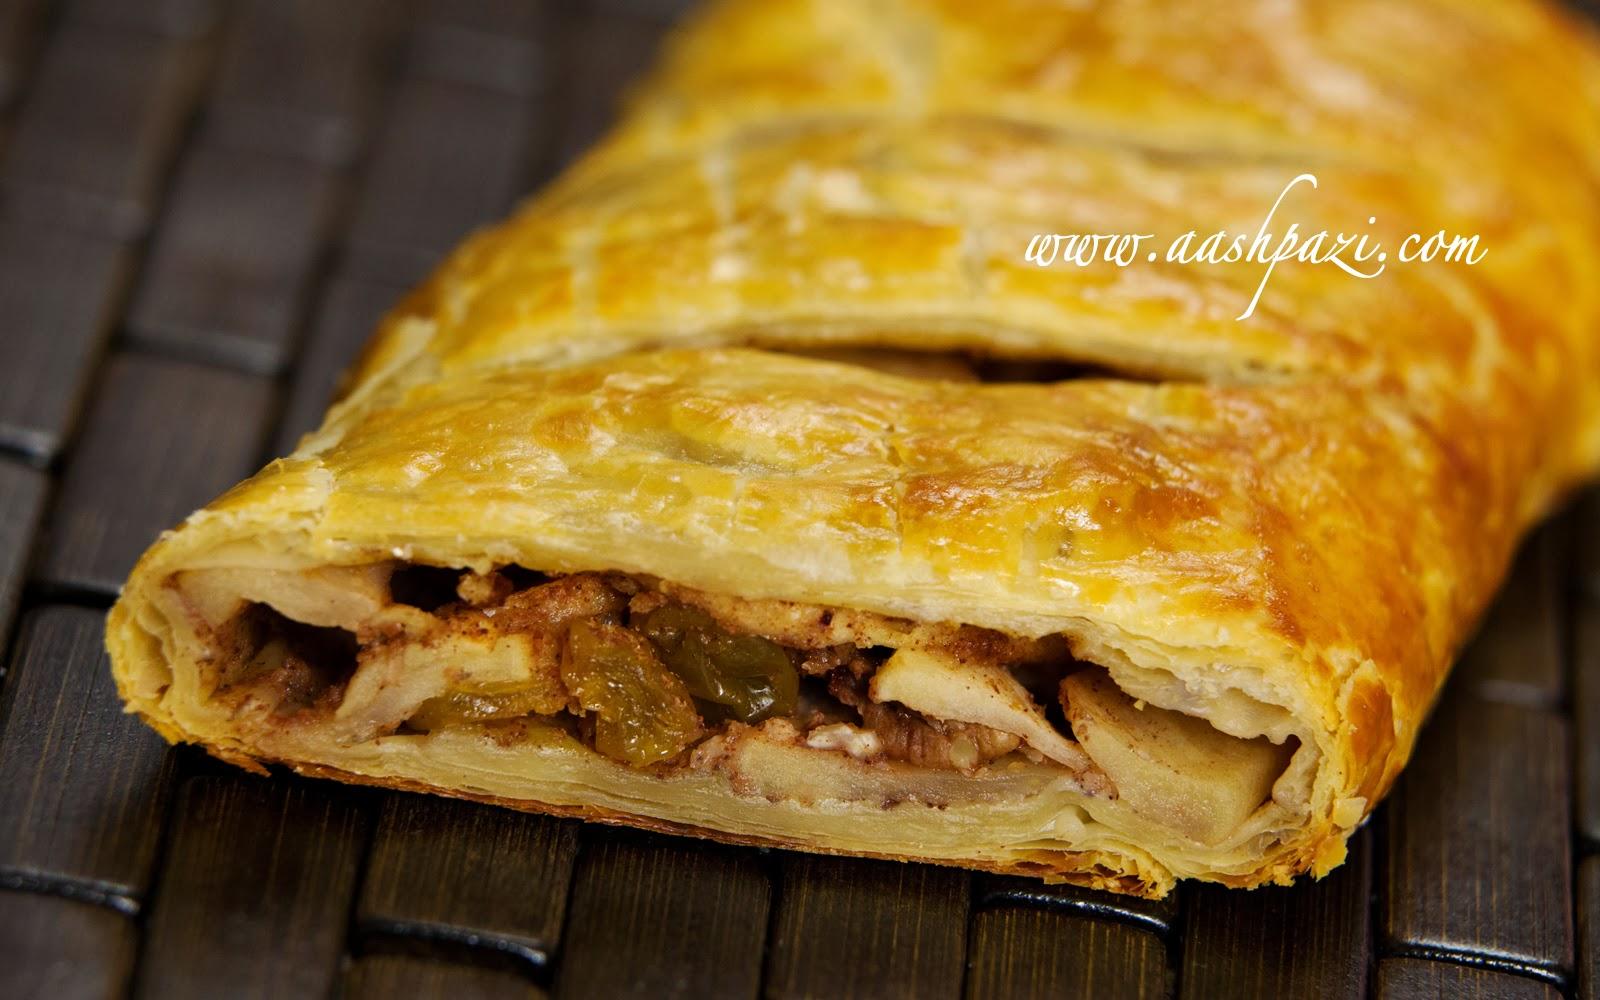 Apple Strudel Recipe | aashpazi